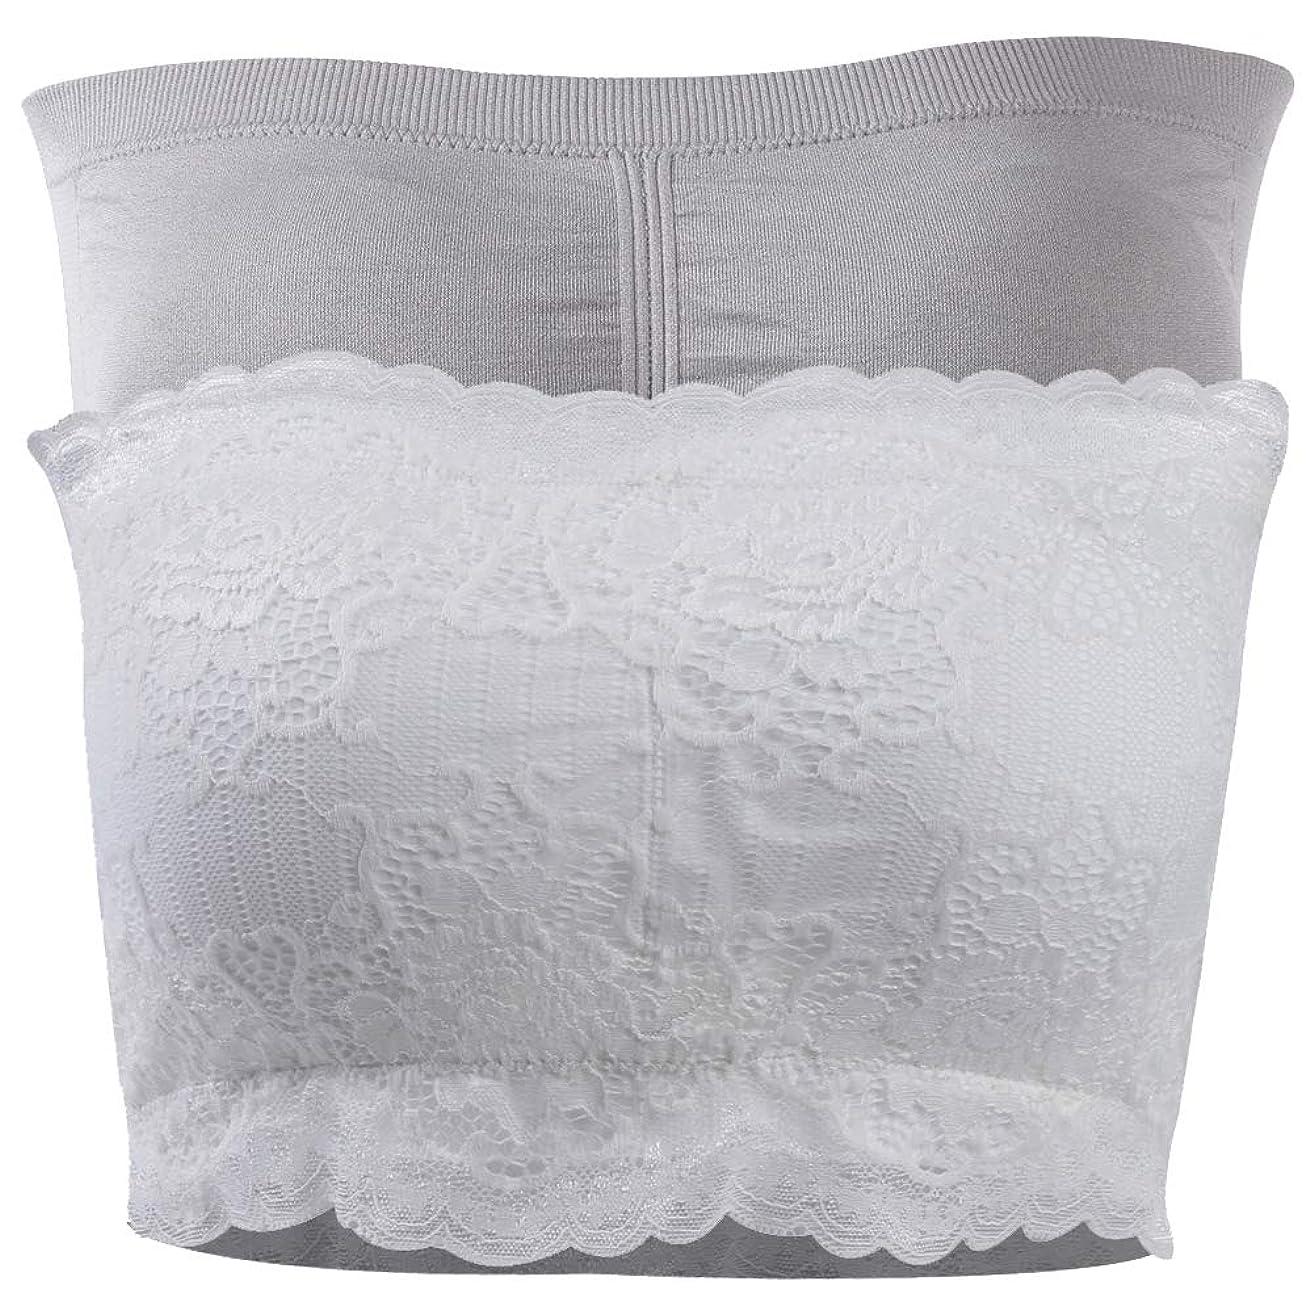 DD DEMOISELLE Women's Bandeau Bra, Basic Layering Seamless Bra Crop Tube Top Bandeau Strapless Brarette